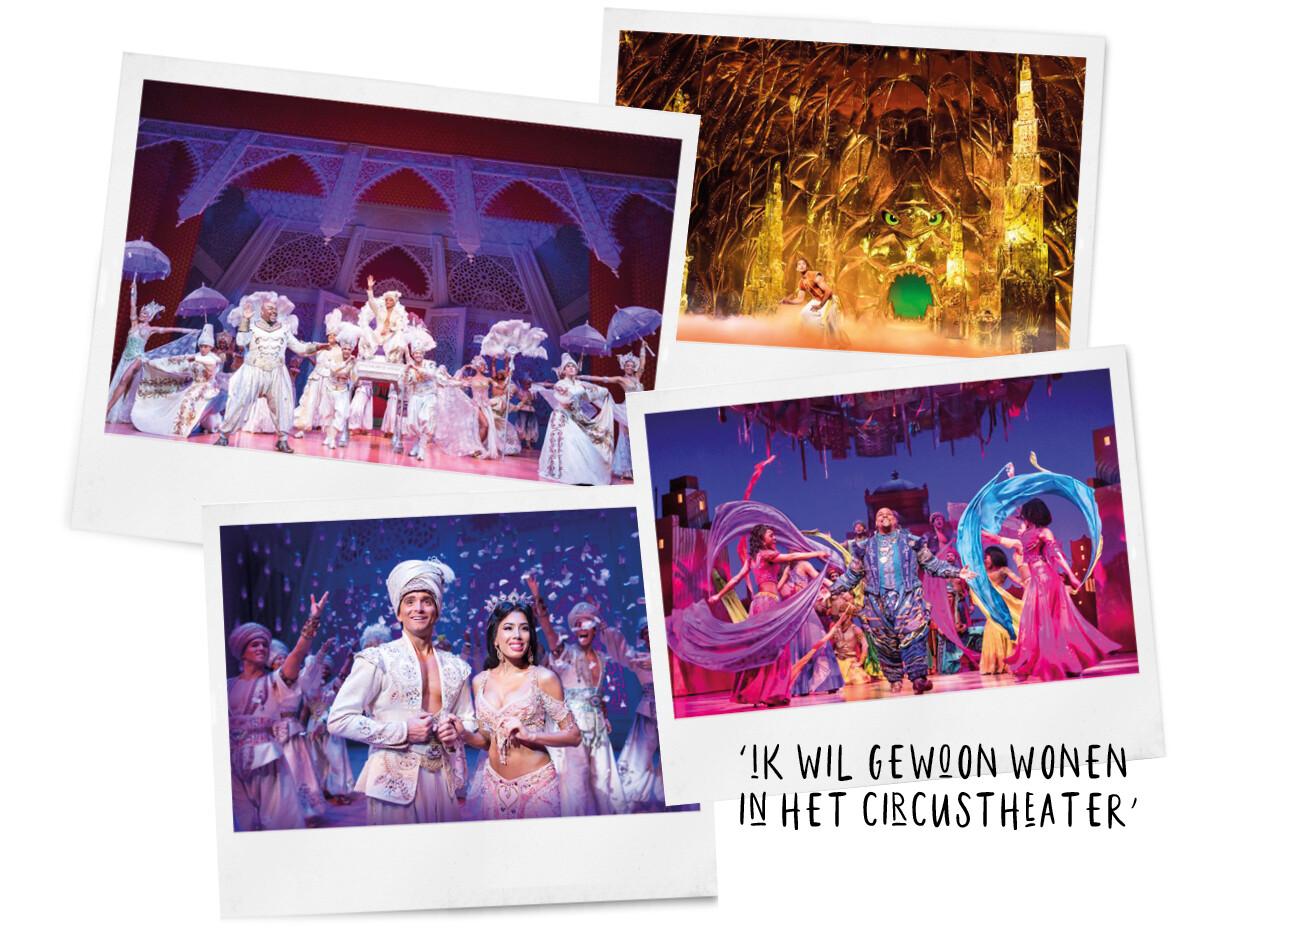 Premièrereport: Aladdin de musical is een zeldzame hit